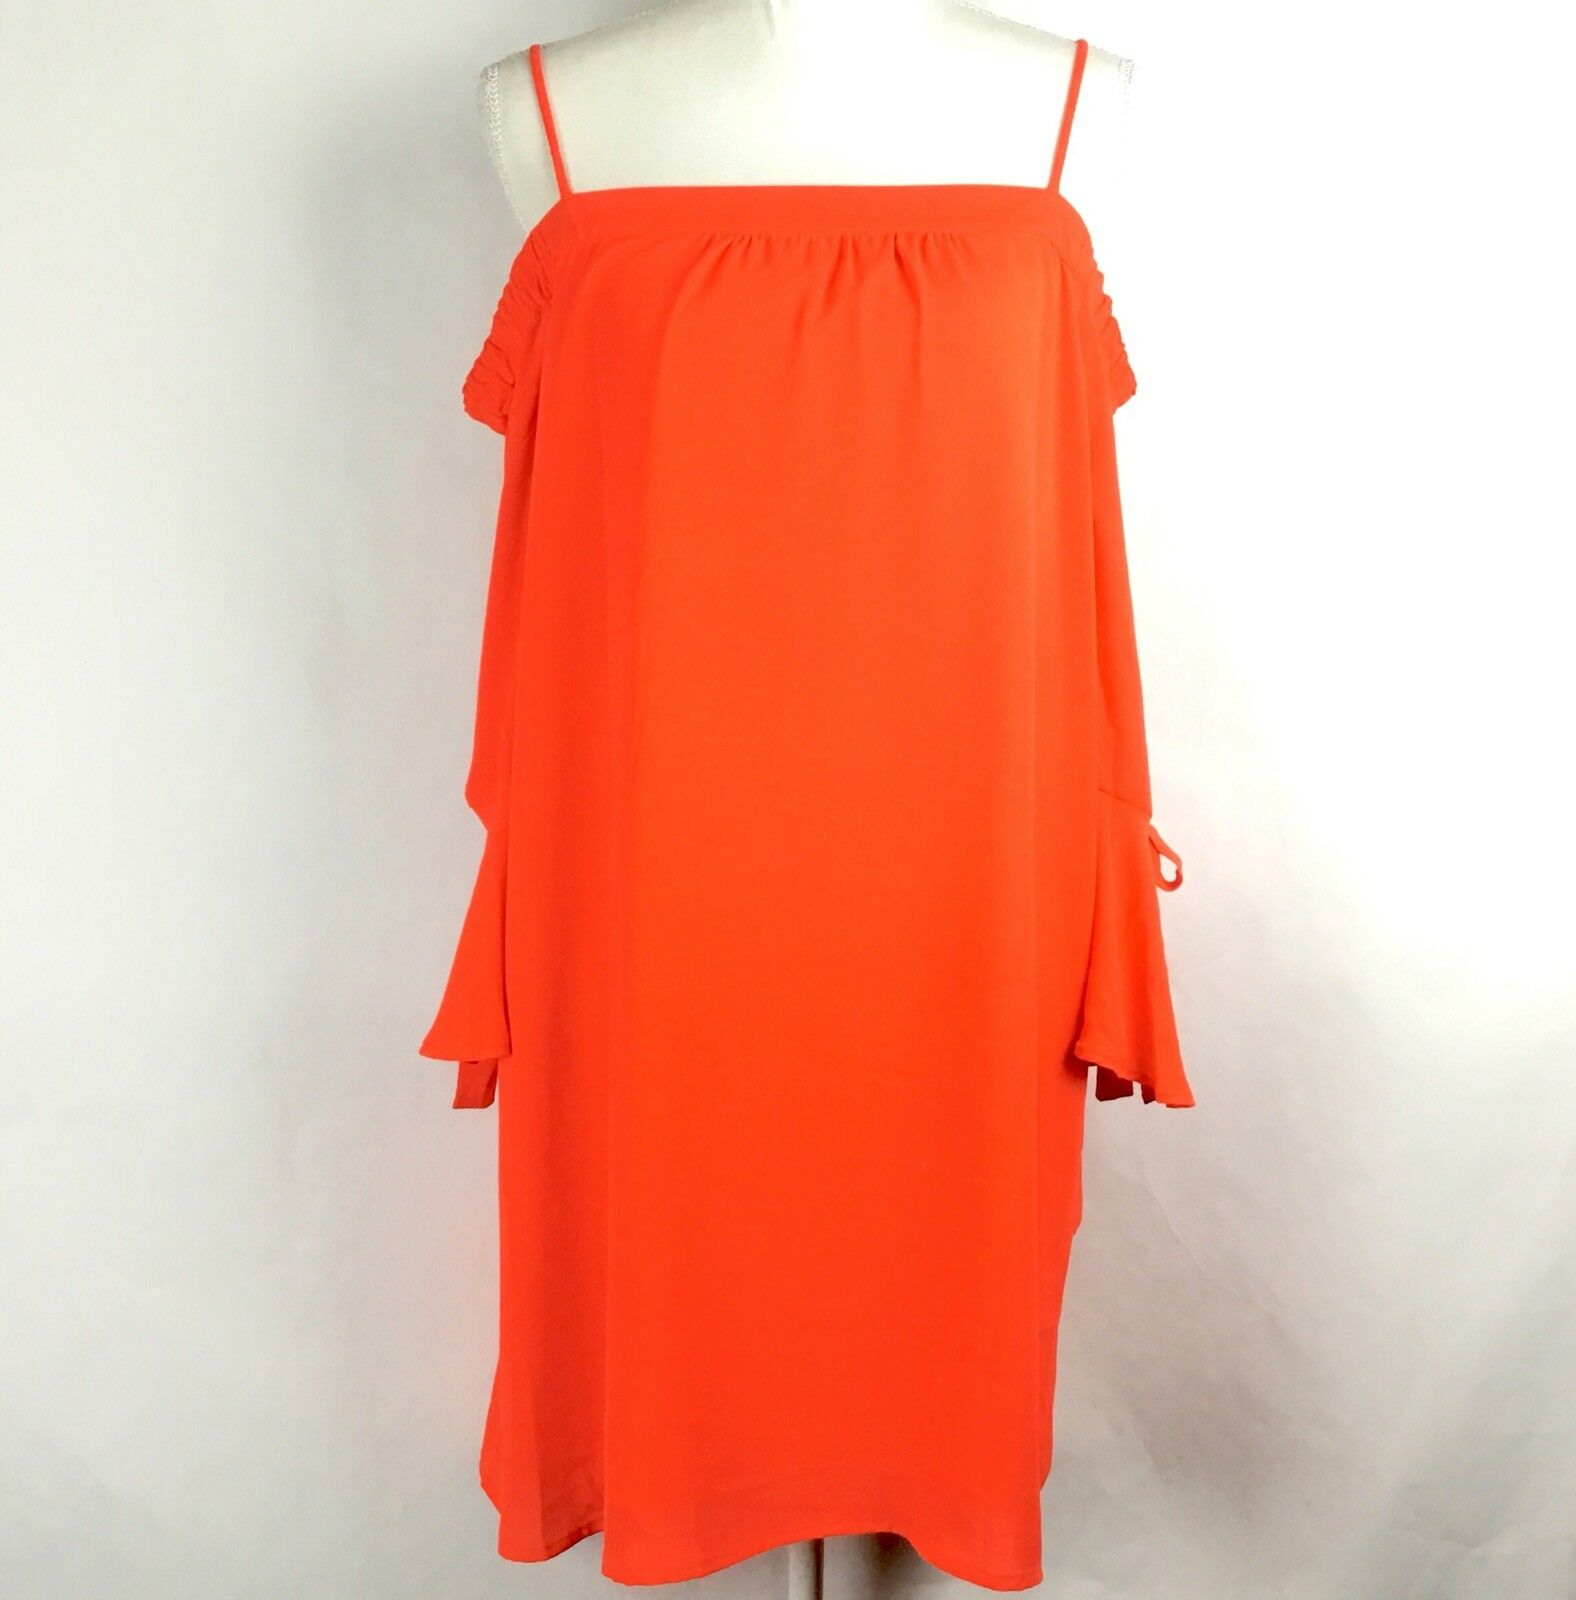 Skies Are Blau damen Dress Orange Off The Shoulder 3 4 Sleeve Ruffle Sz S NWT